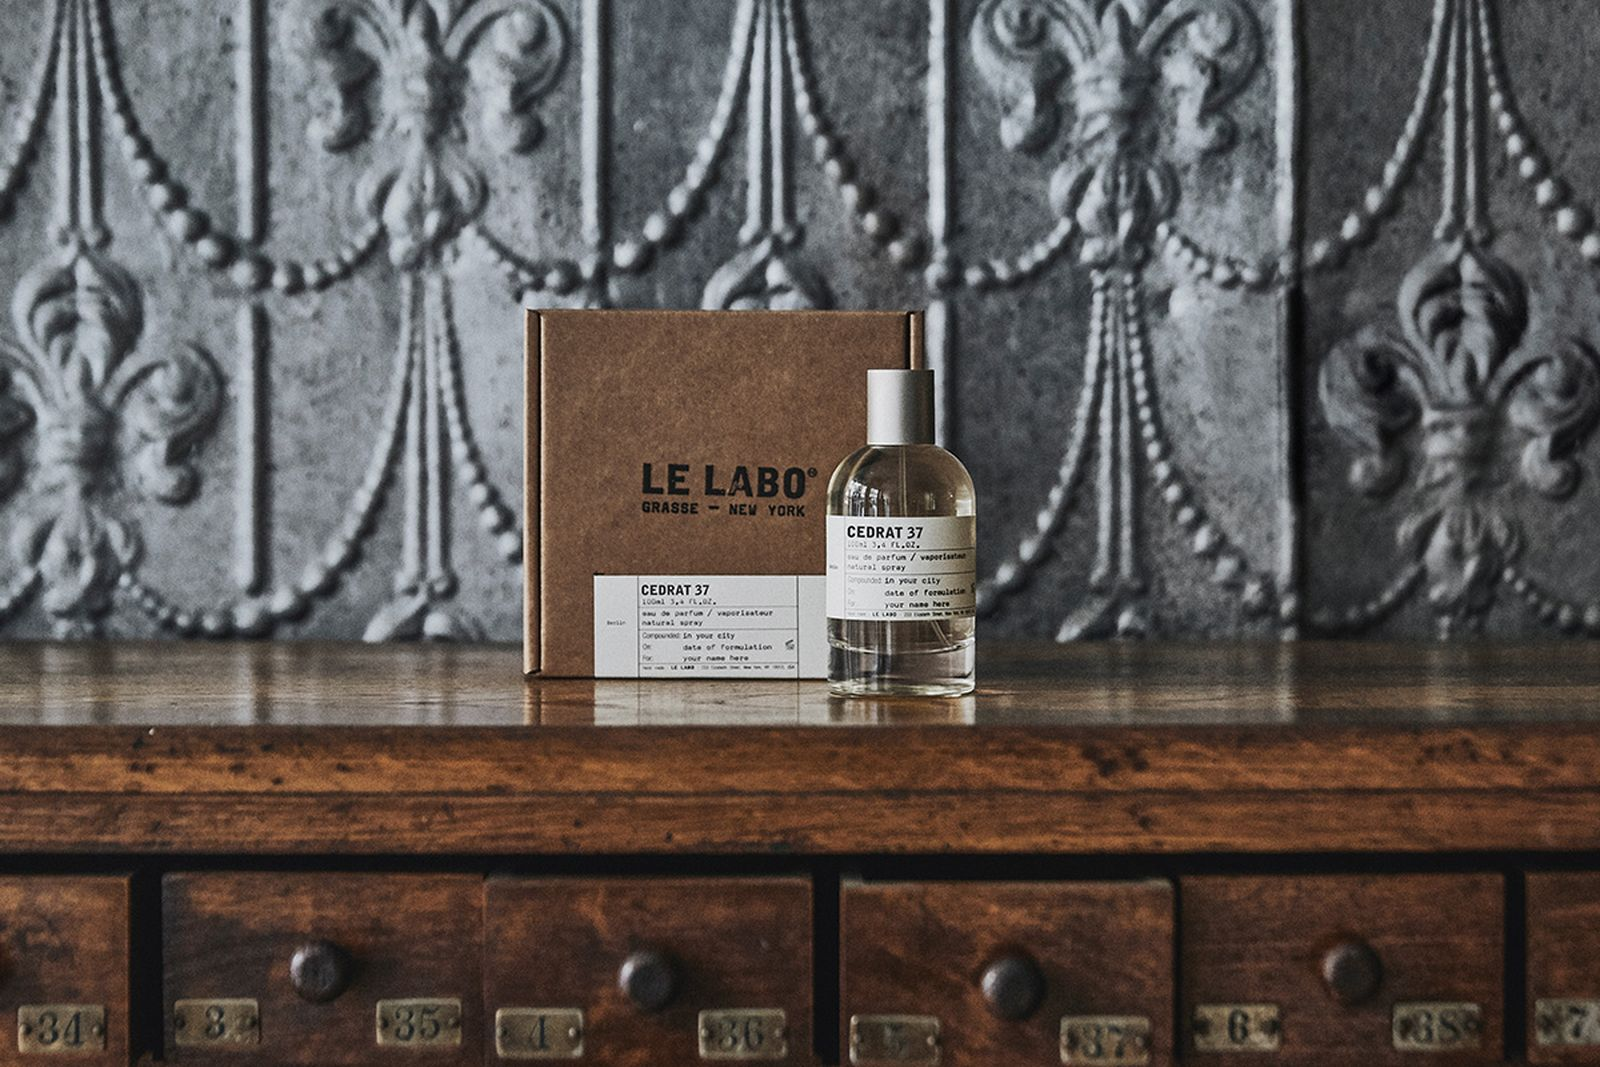 le-labo-berlin-city-exclusive-fragrance-02